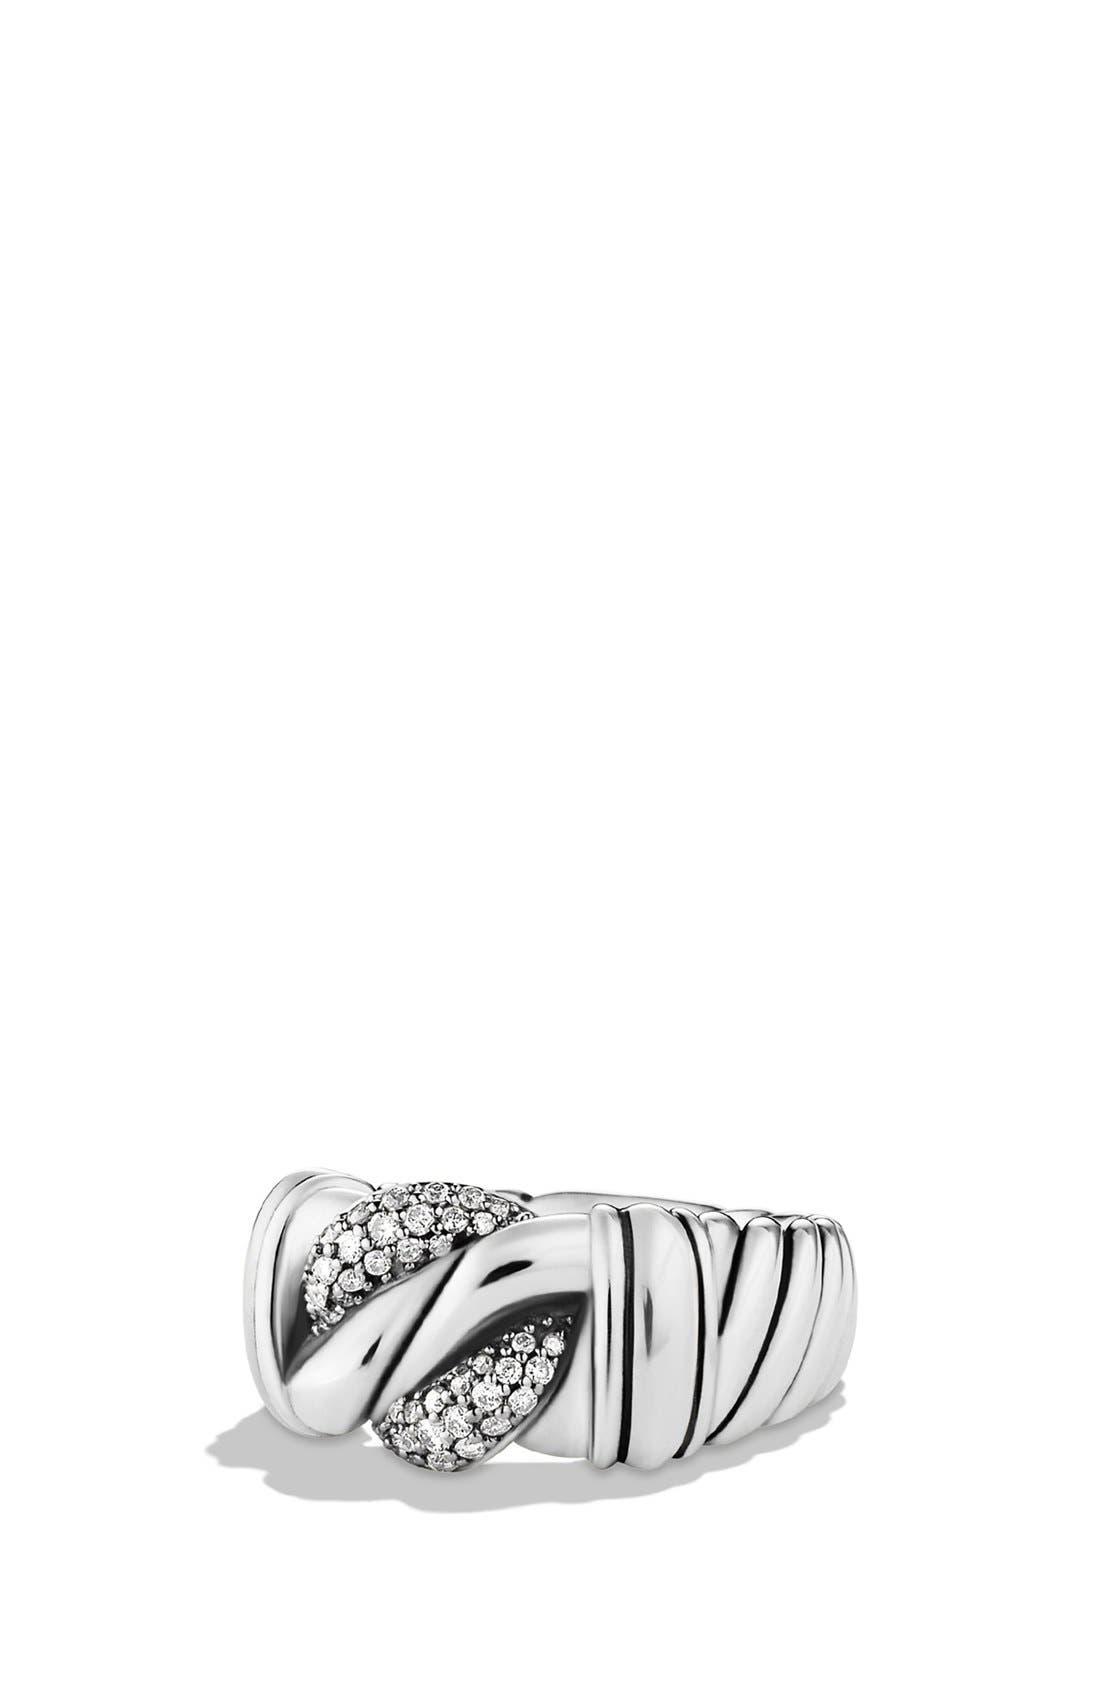 Alternate Image 1 Selected - David Yurman 'Metro' Curb Wide Ring with Diamonds